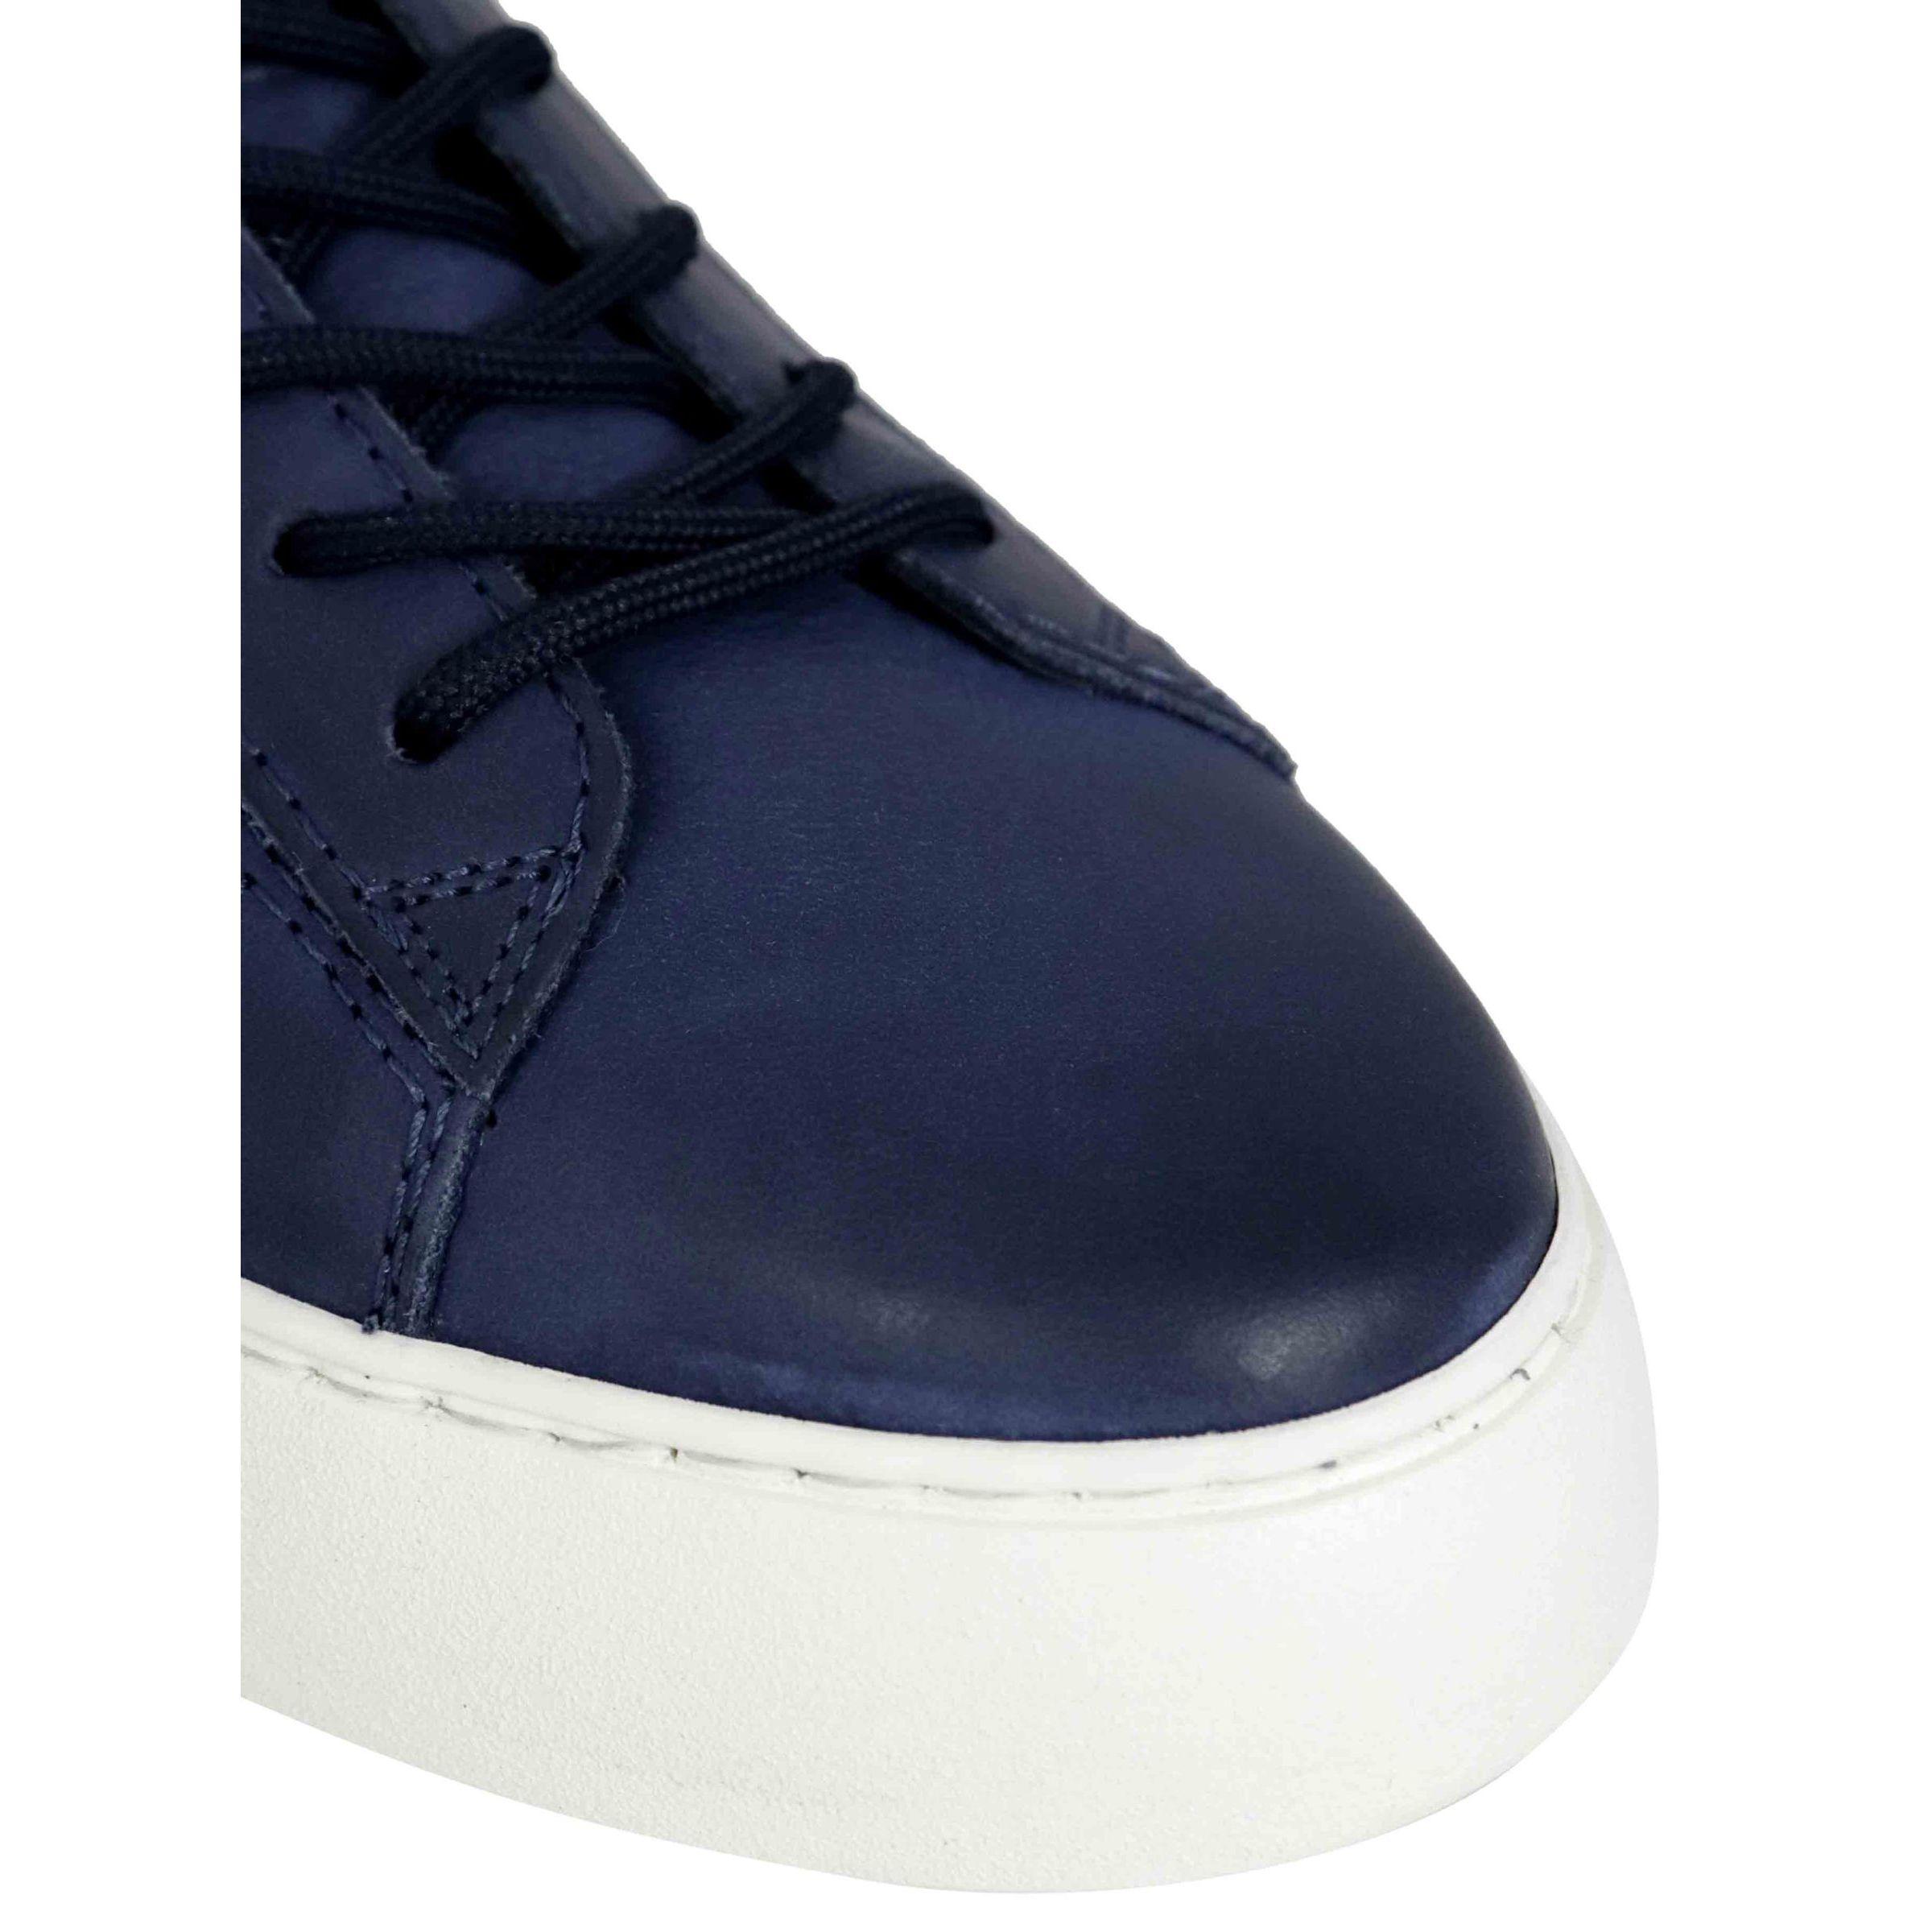 Sneakers Hogan Rebel derby H in pelle Blu, hxm5260cw02px6 ...